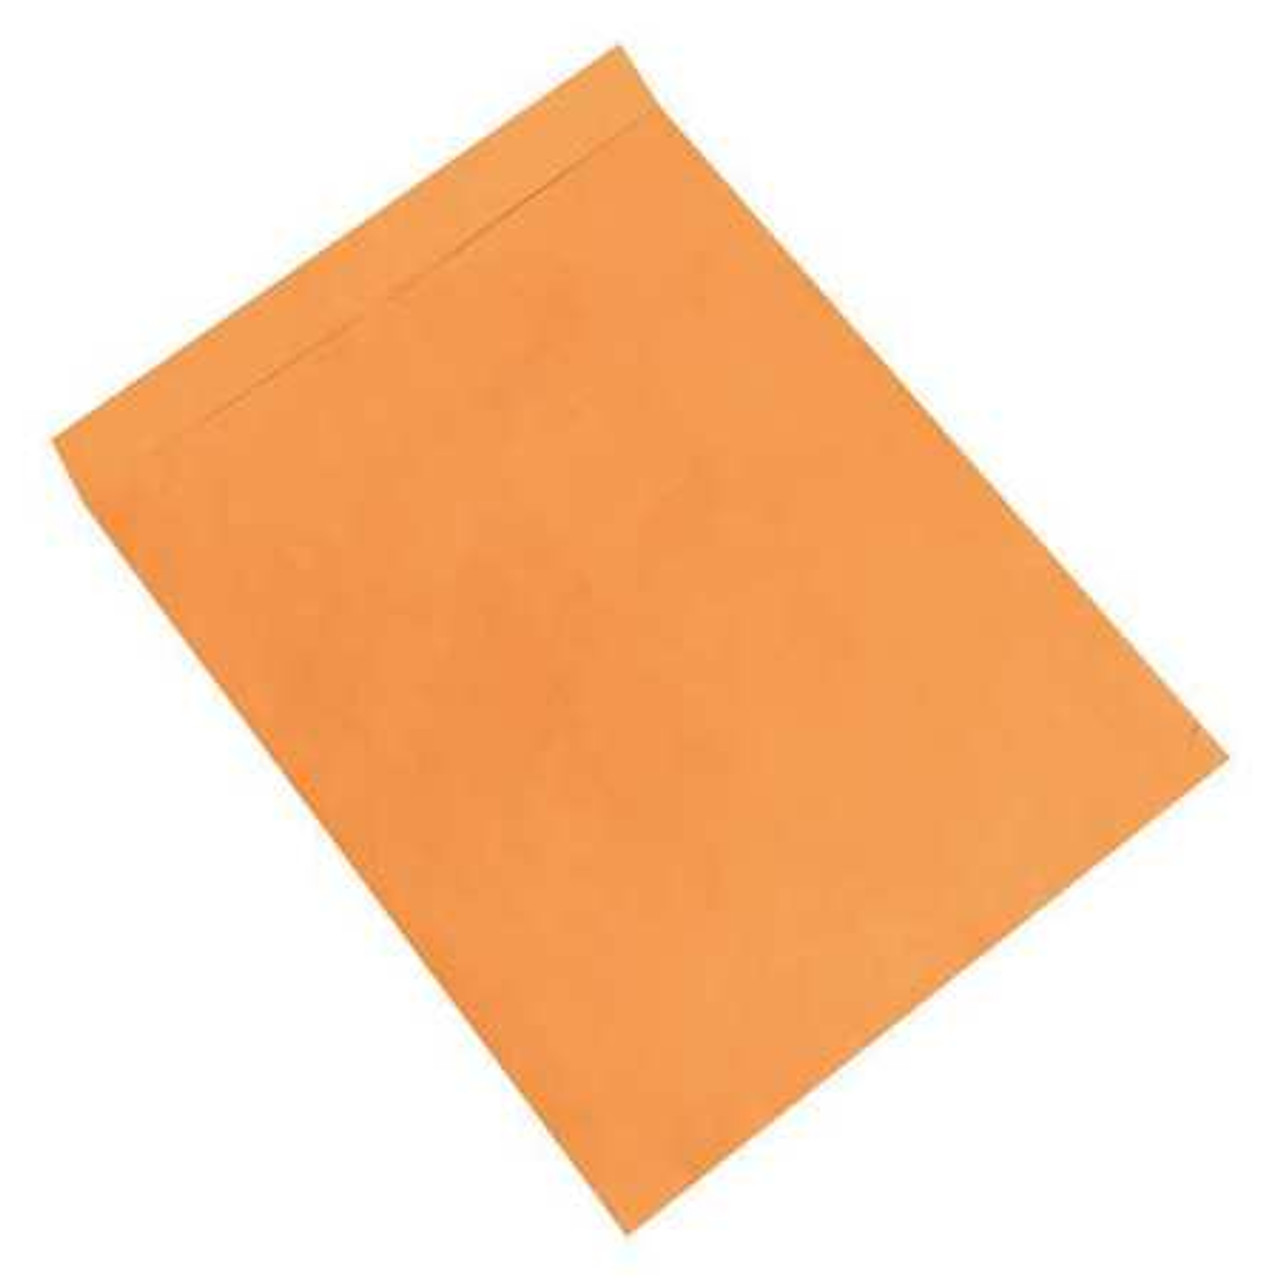 "Large Kraft Jumbo Envelopes  22"" x 27"" qty 100 (PC-22x27-100)"